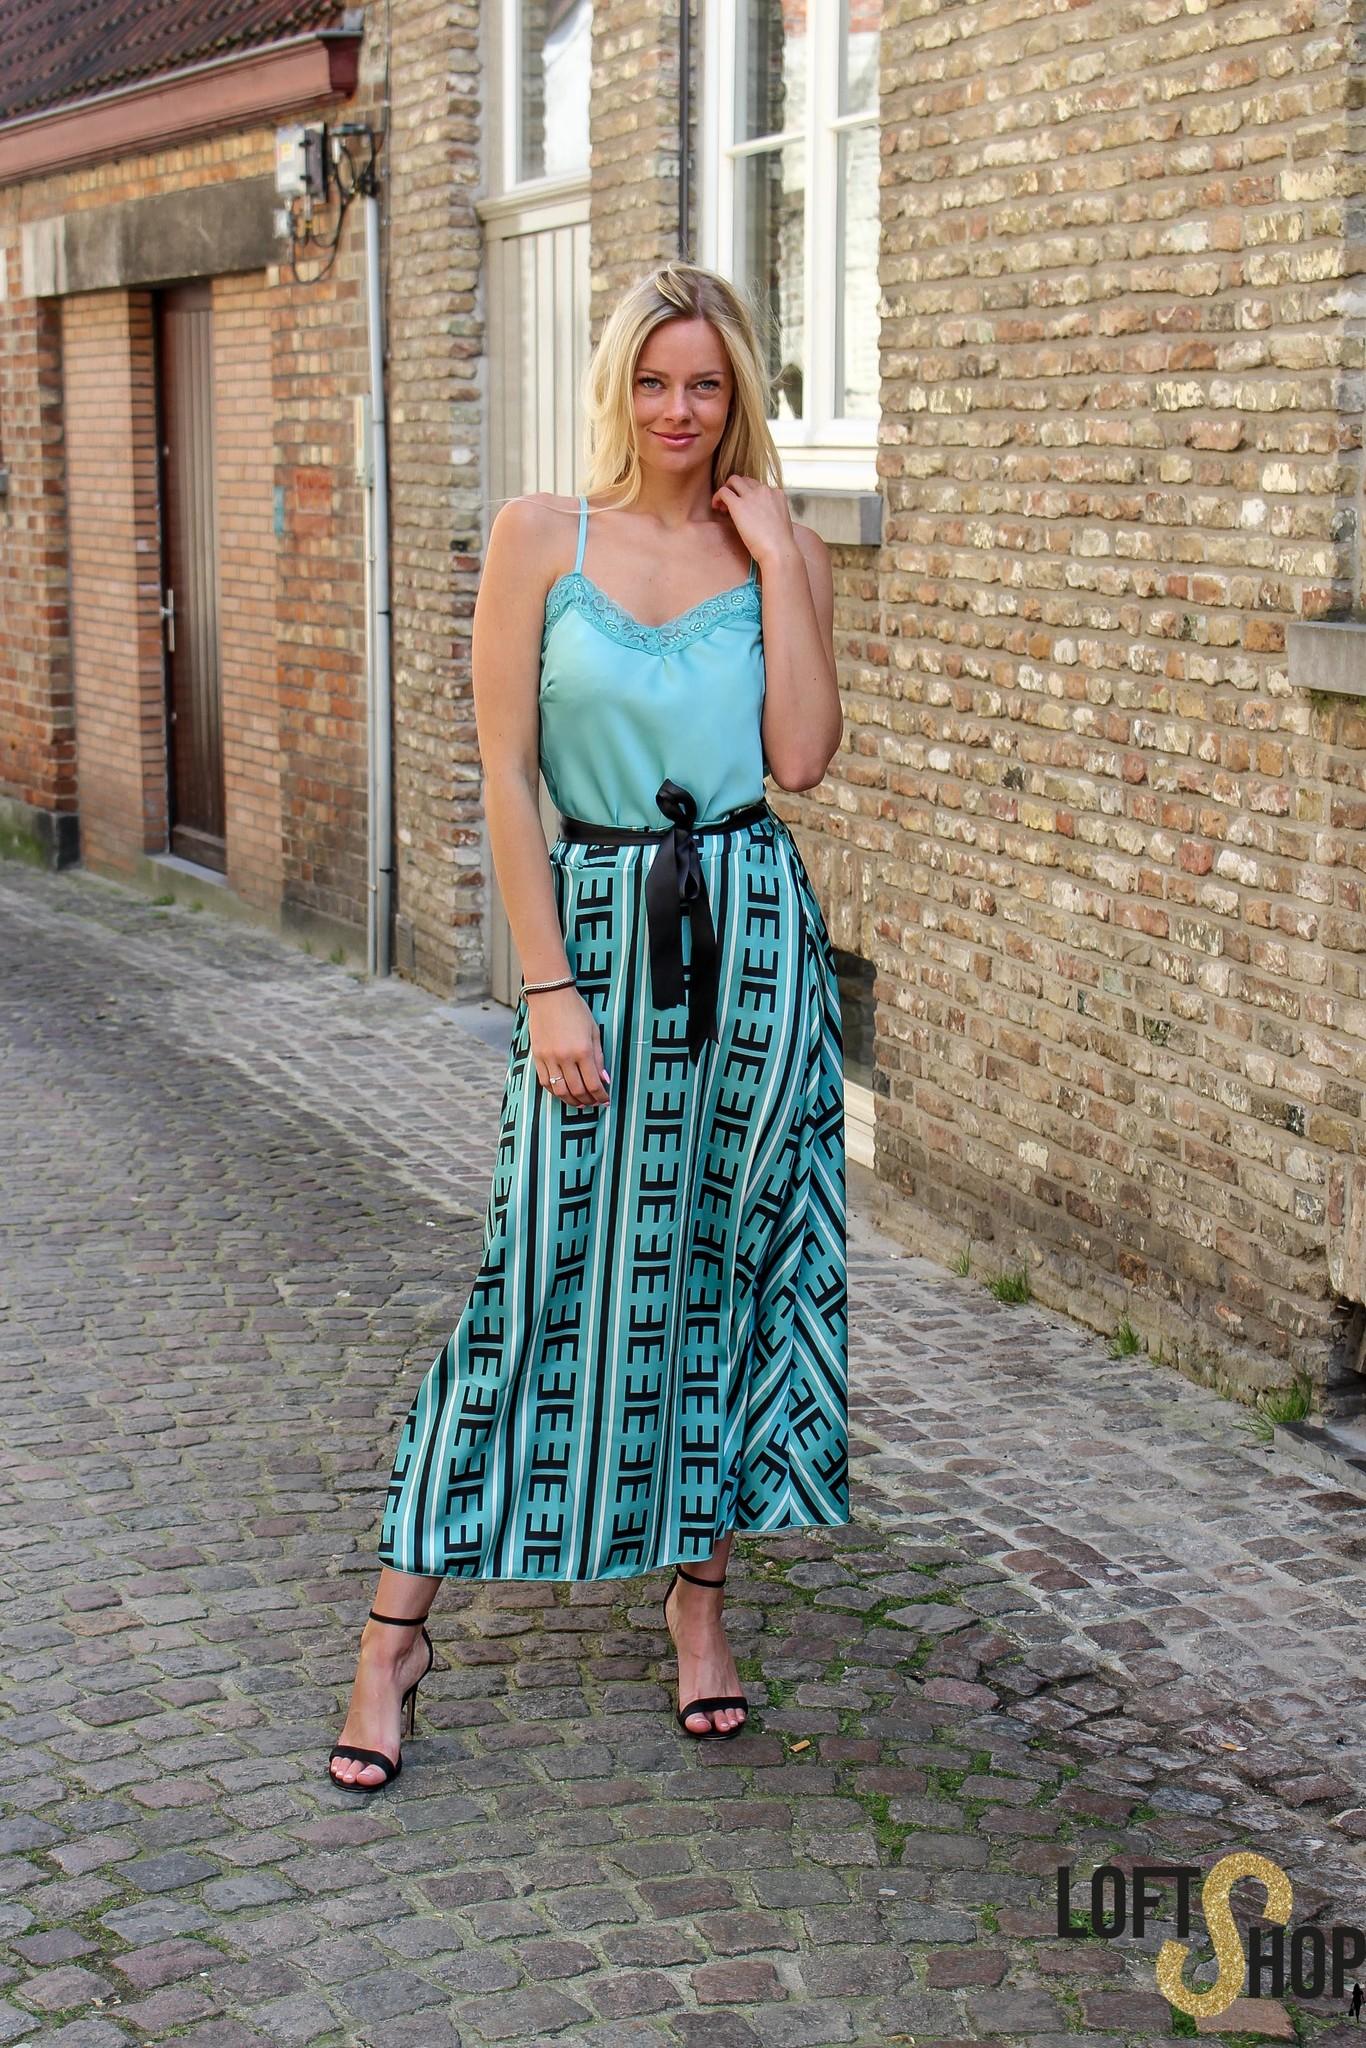 Lisa Fashion Top Elle Turquoise TU